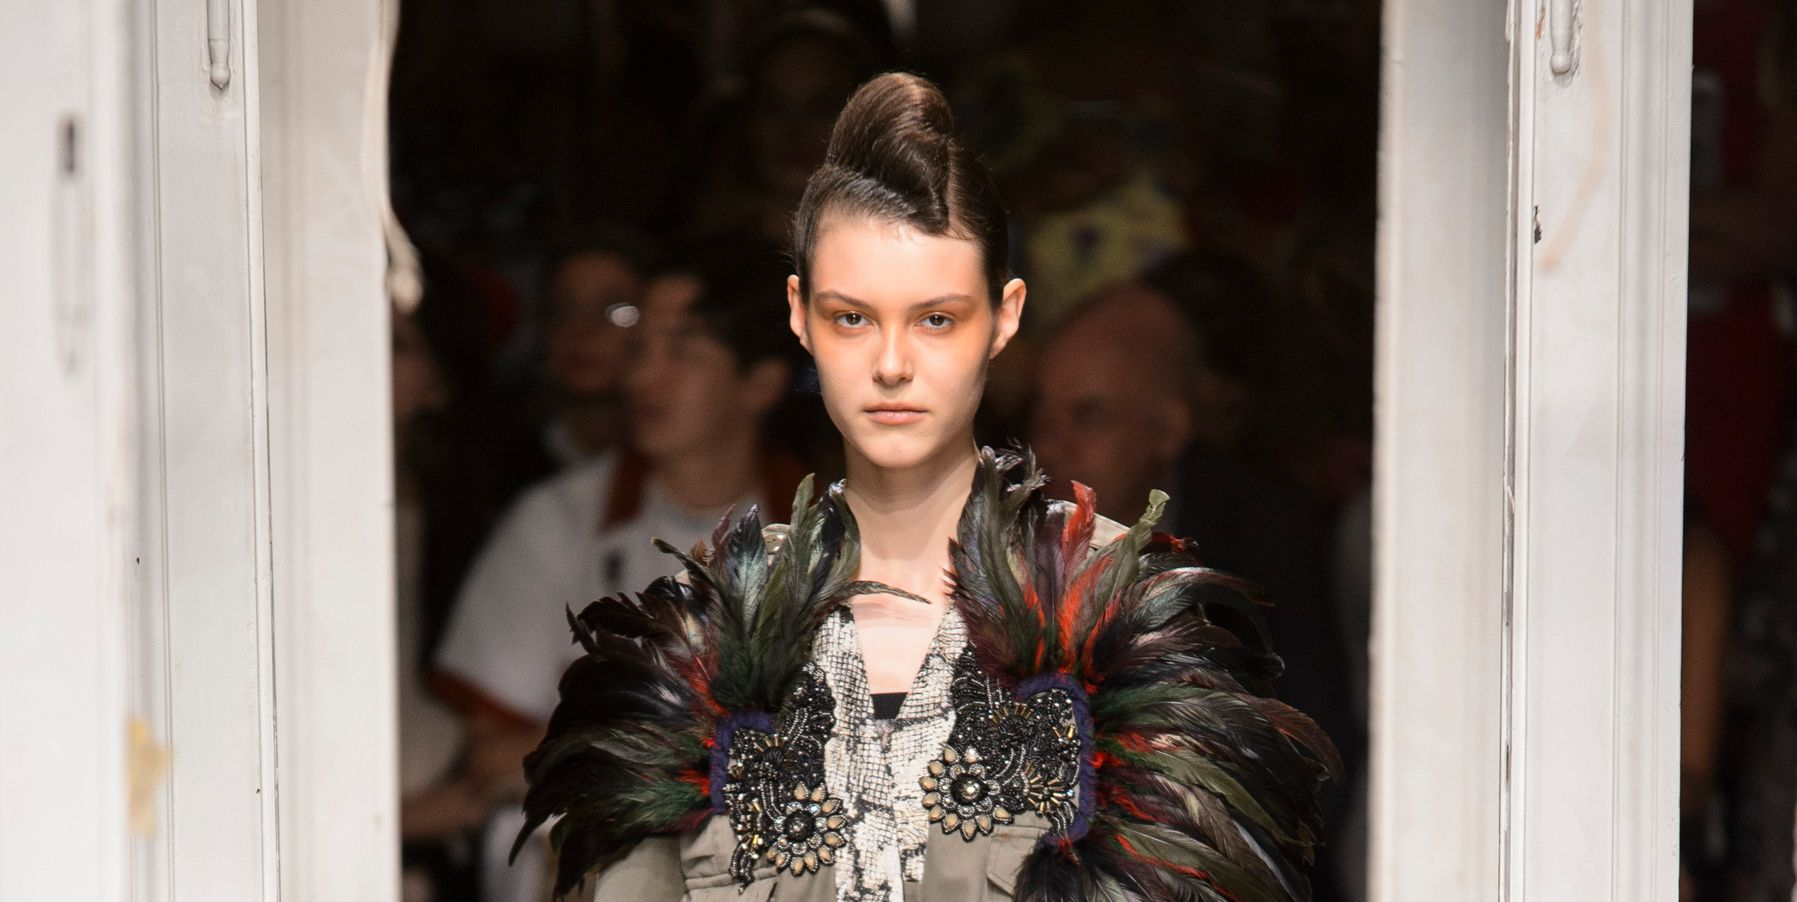 Antonio Marras, Antonio Marras SS 19, MFW, MFW SS 19, Milano fashion week, fashion week, milano, primavera estate 2019, real time women SS 19, sfilate